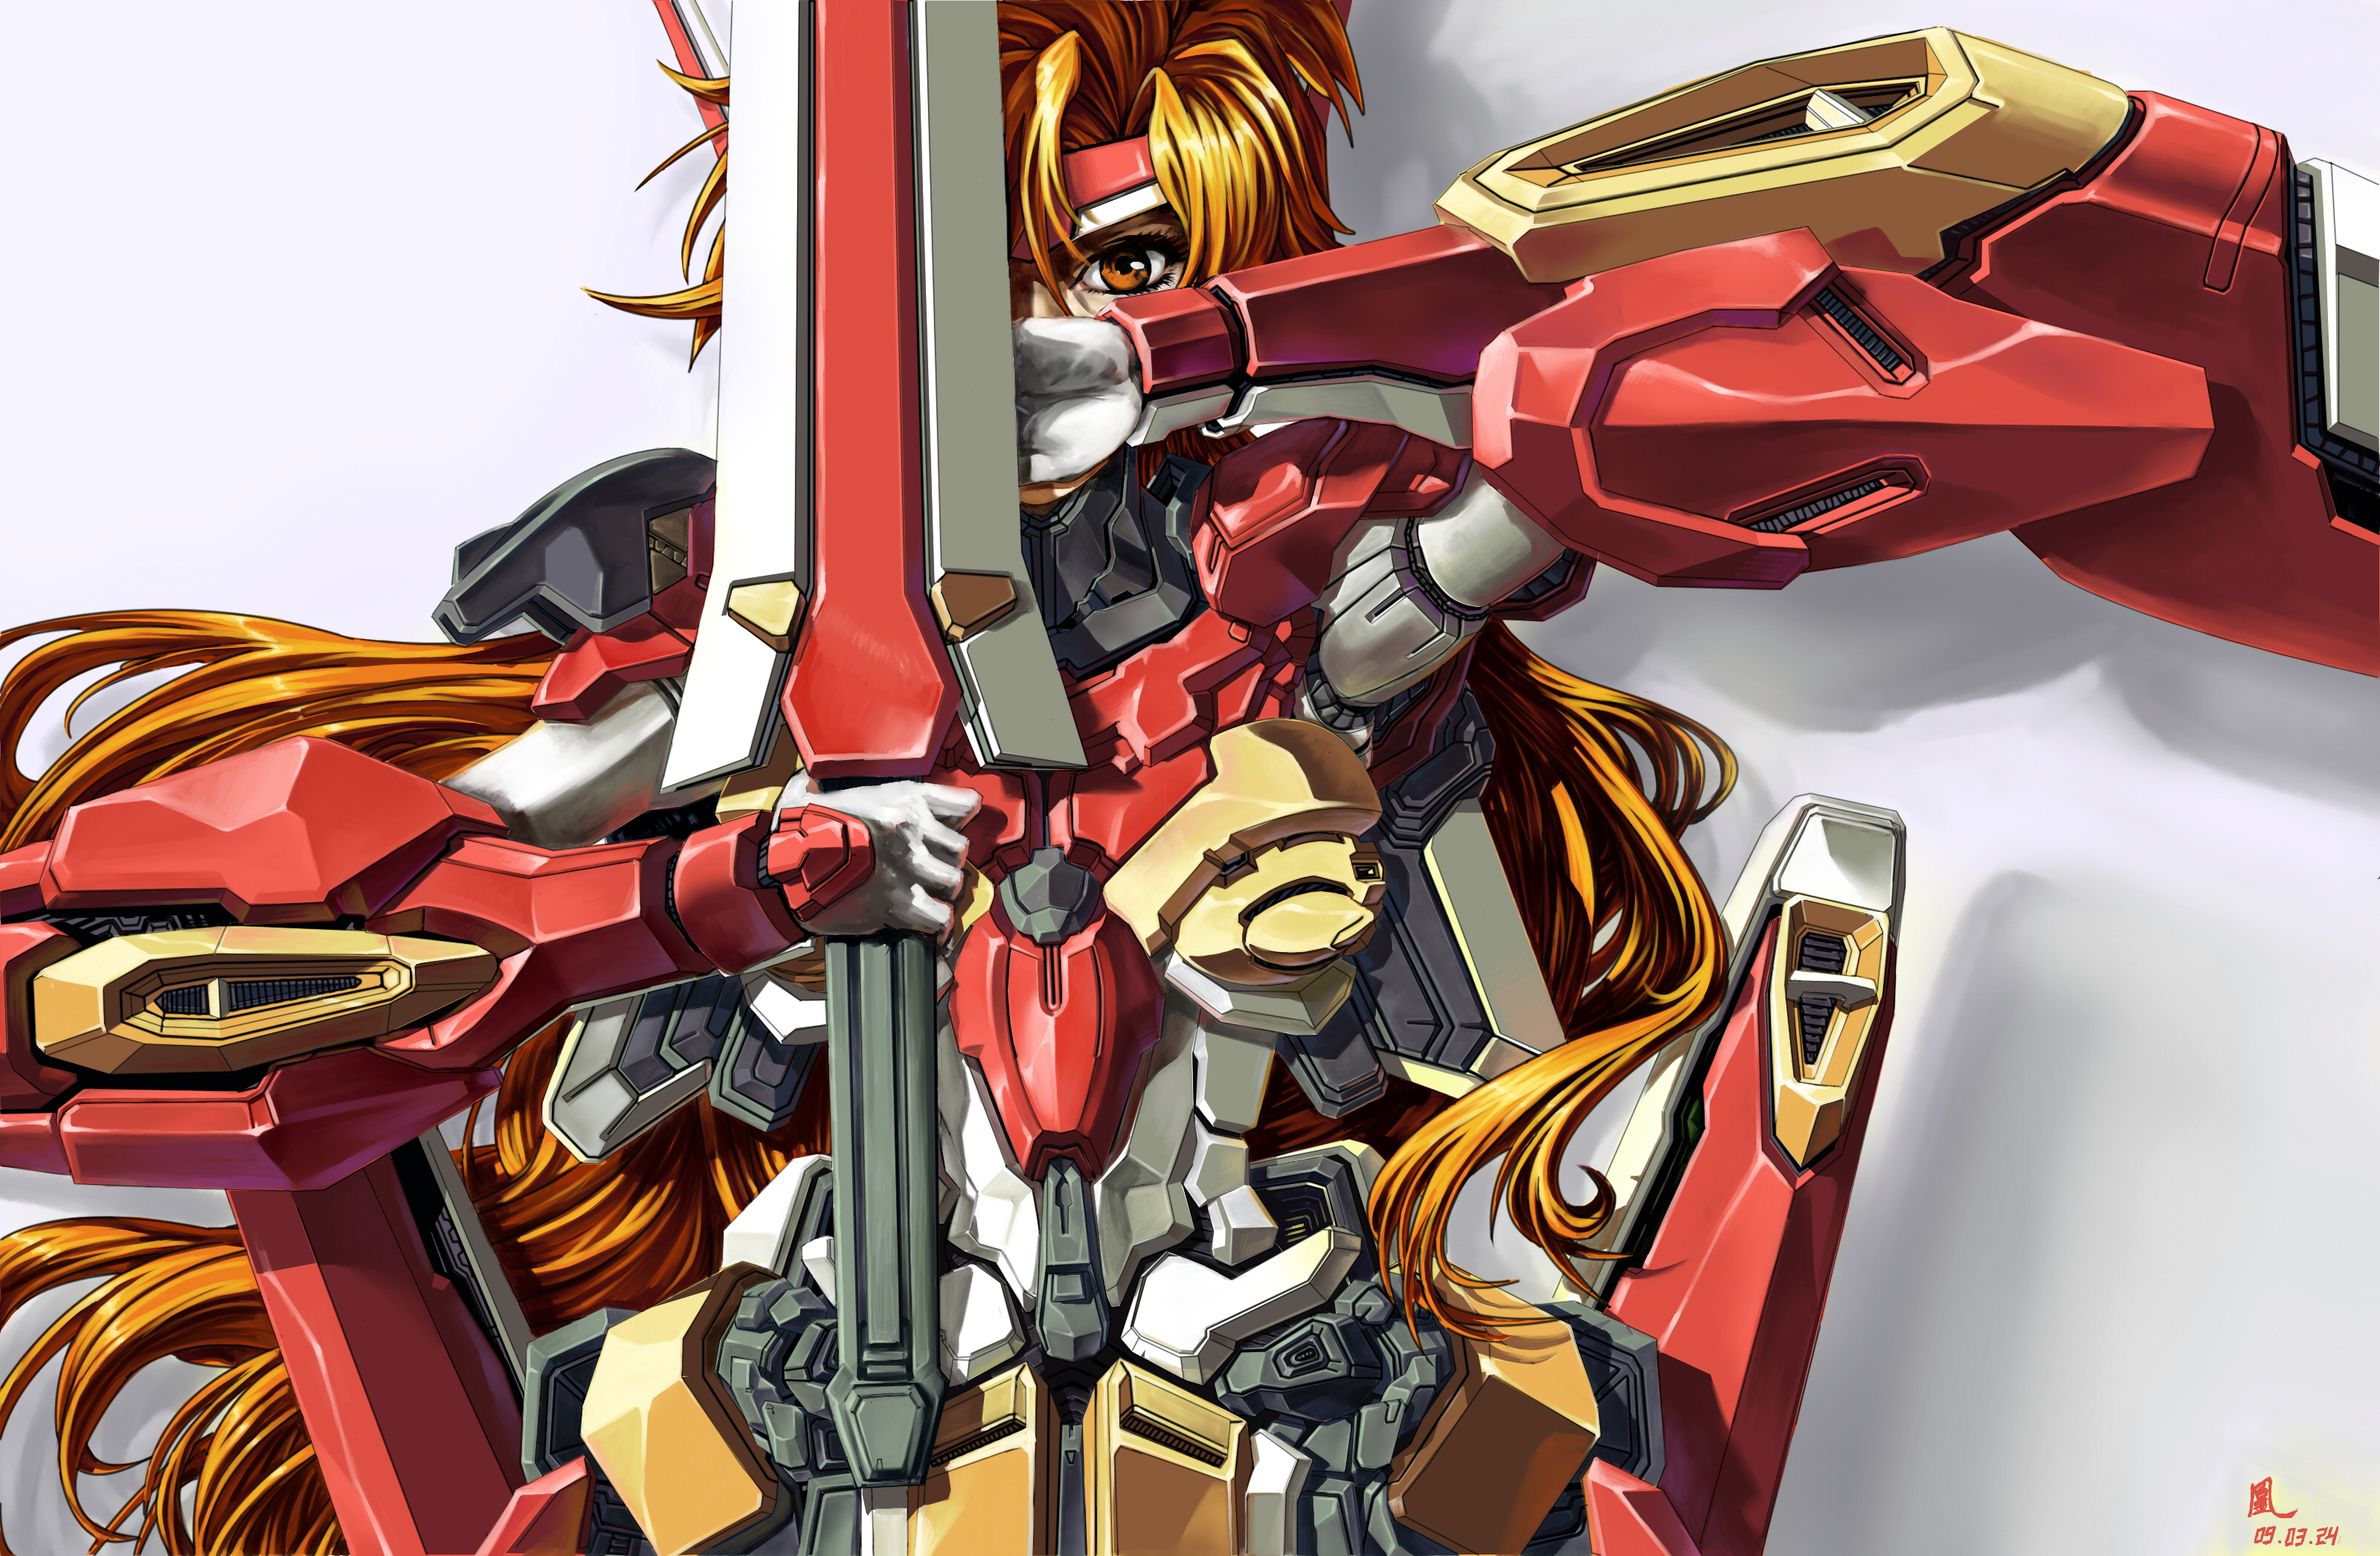 Super Robot Wars #433920